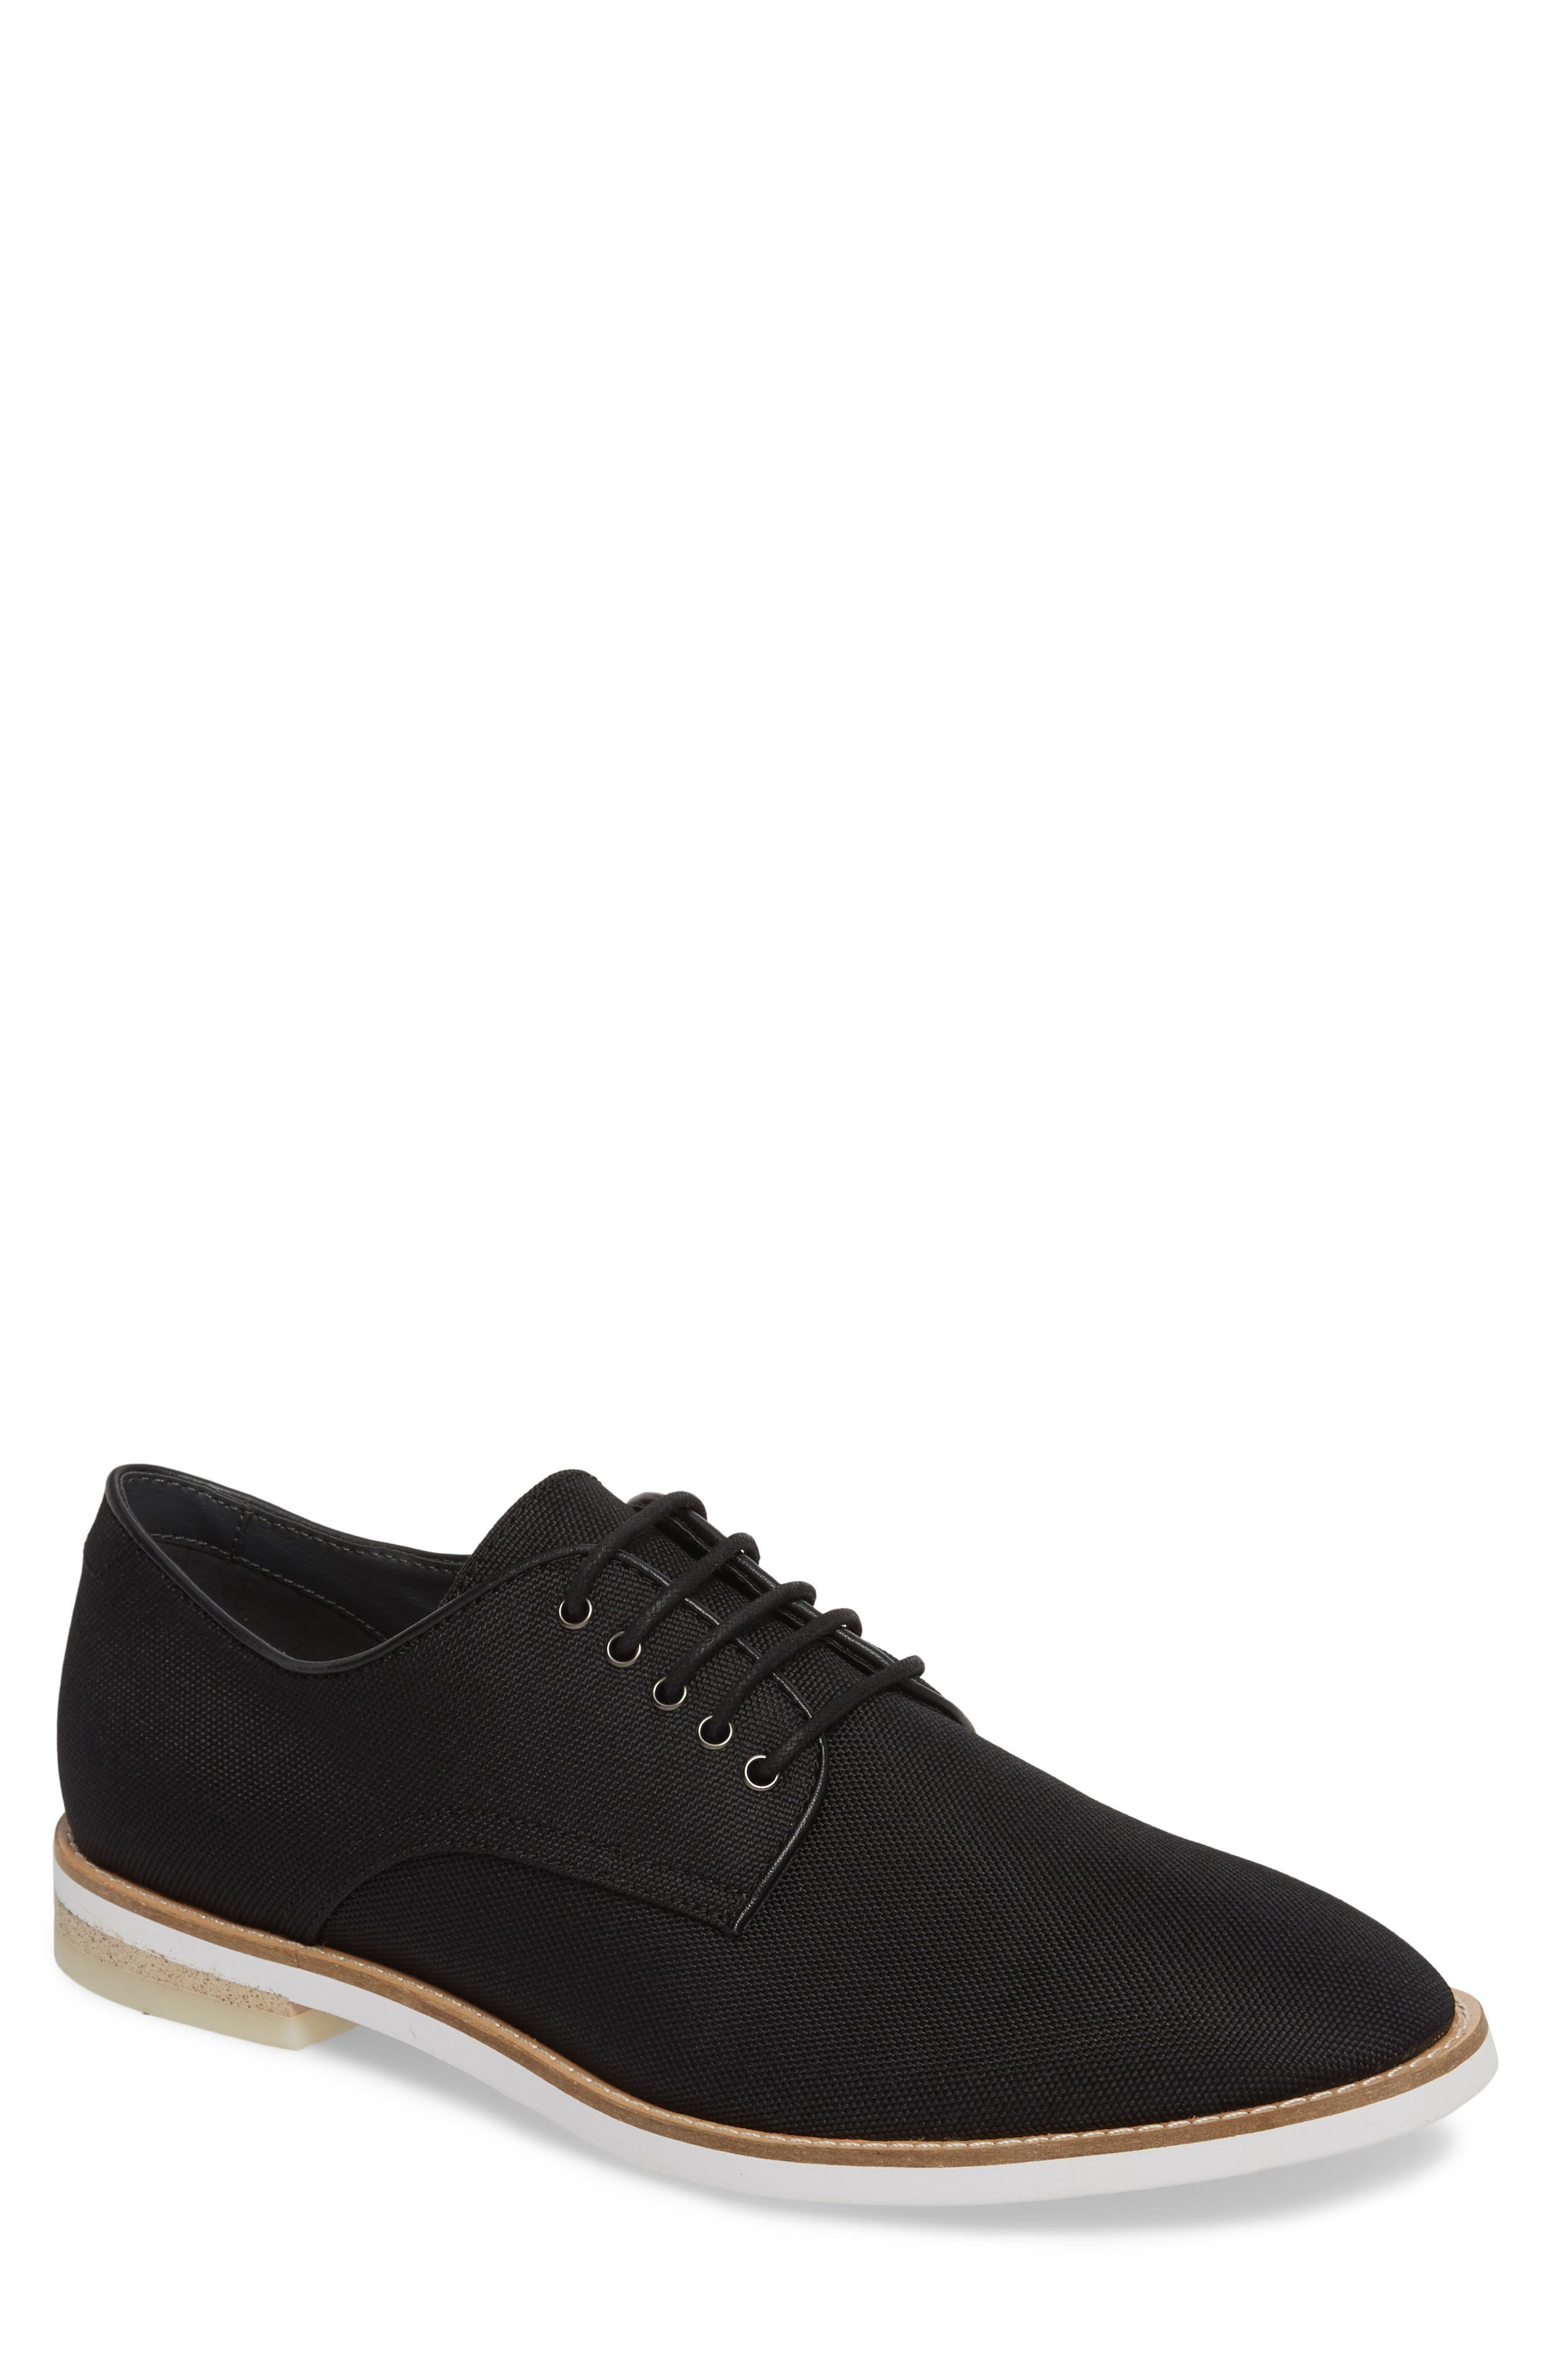 Calvin Klein Atlee Plain Toe Derby (Men)